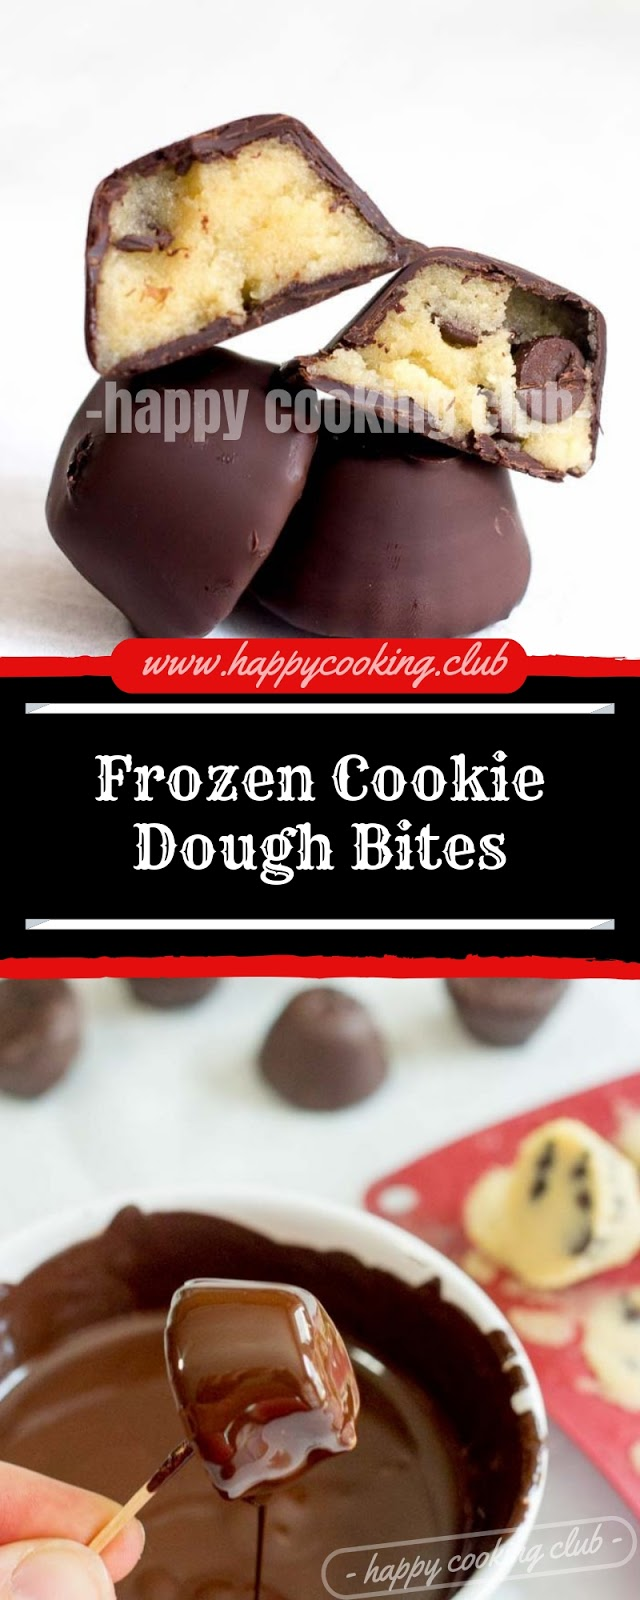 Frozen Cookie Dough Bites